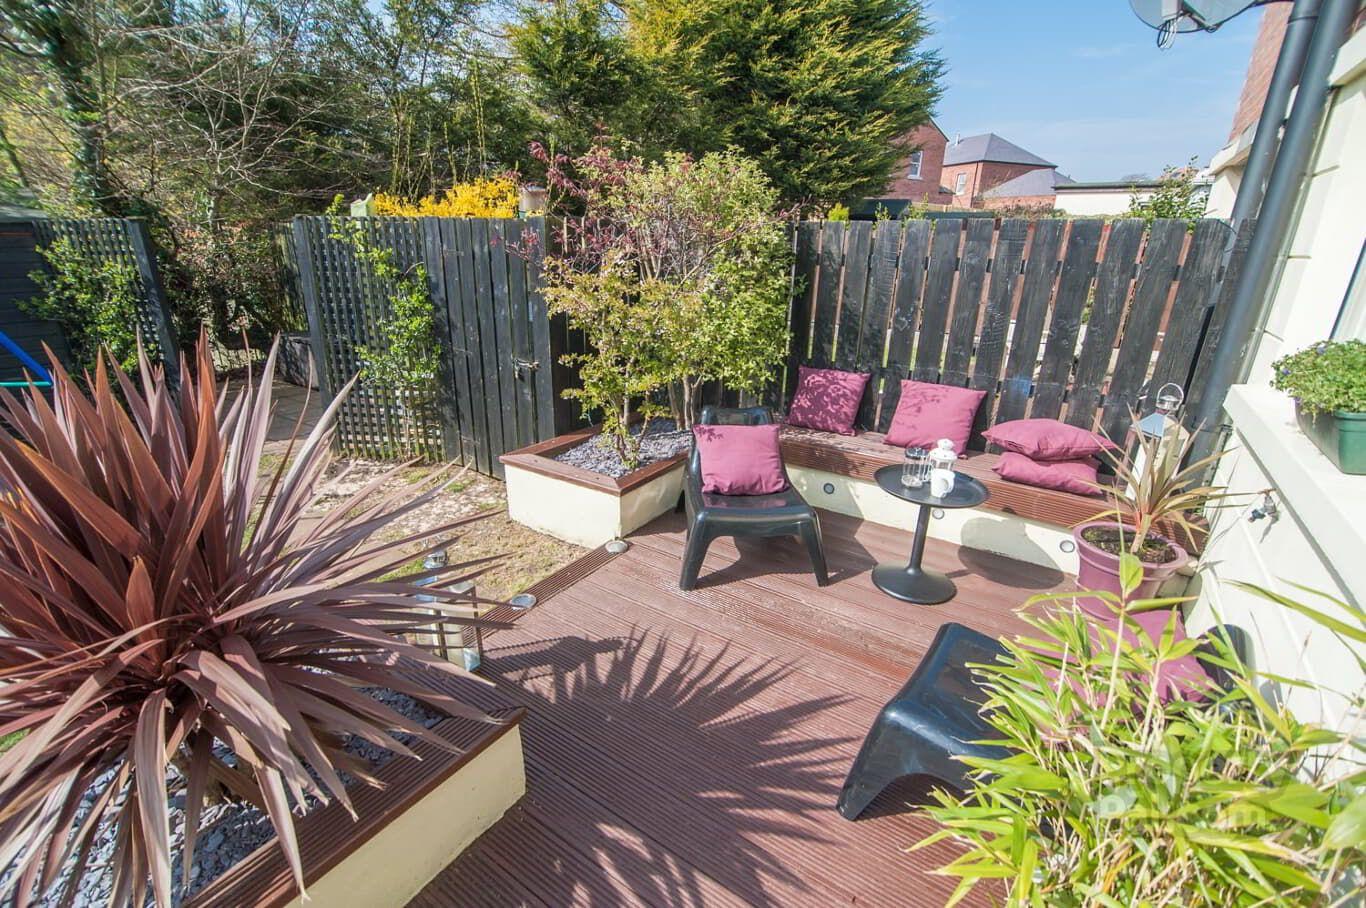 4 Barnoak Lane, Belfast Outdoor furniture sets, Small